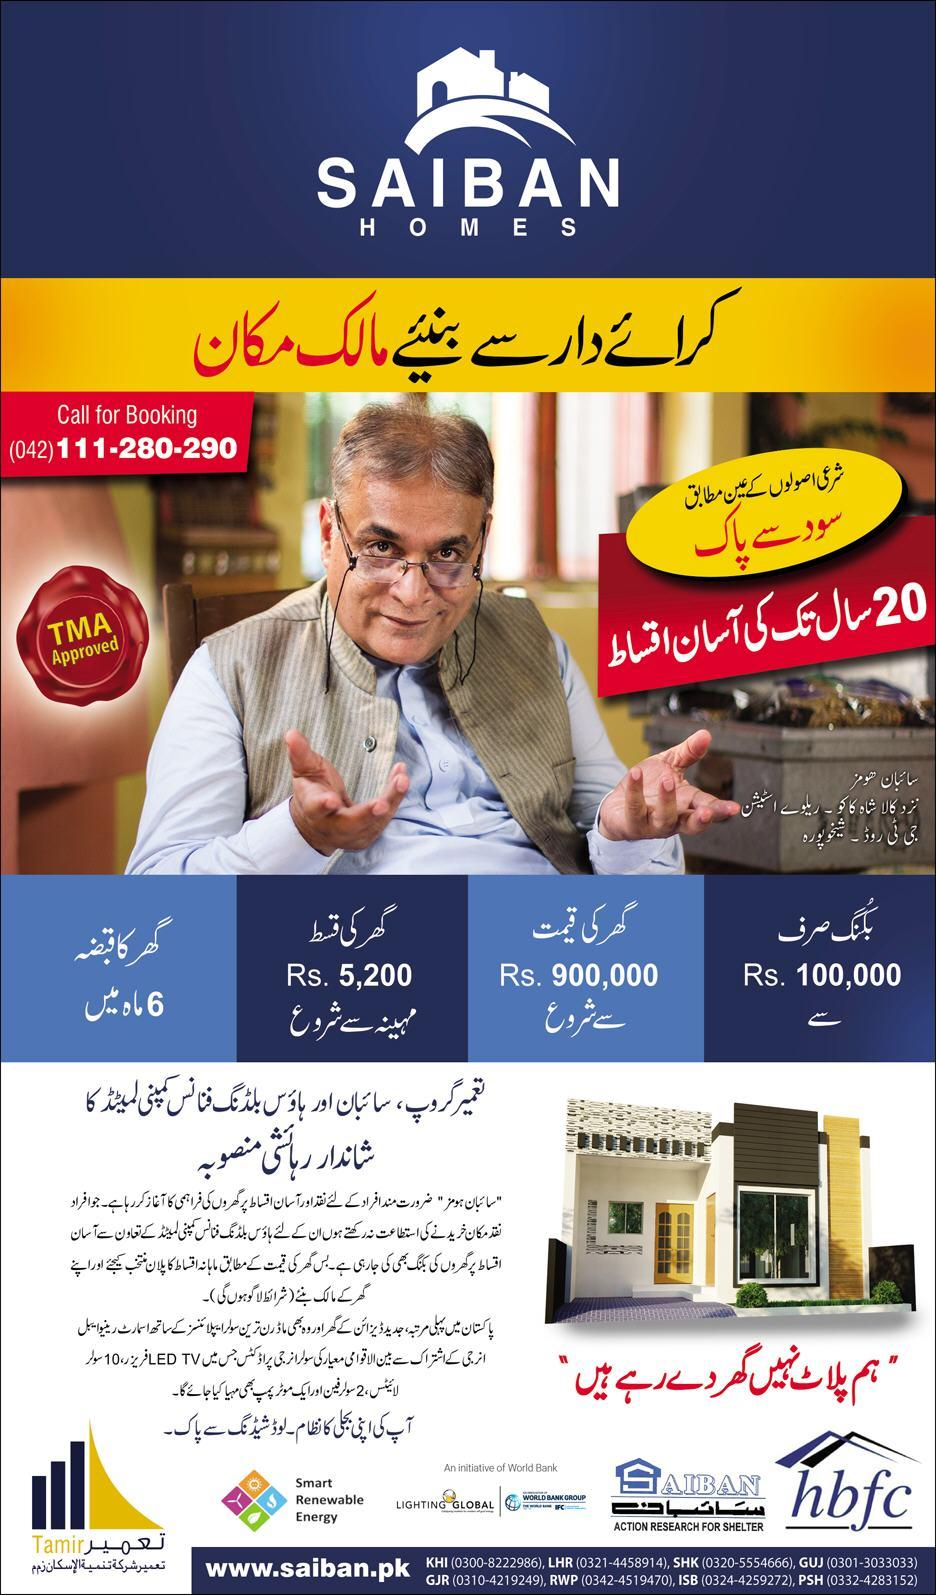 Saiban Homes Kala Shah Kaku Railway Station G T Road Sheikhupura - Lahore Call for Booking 111-280-290